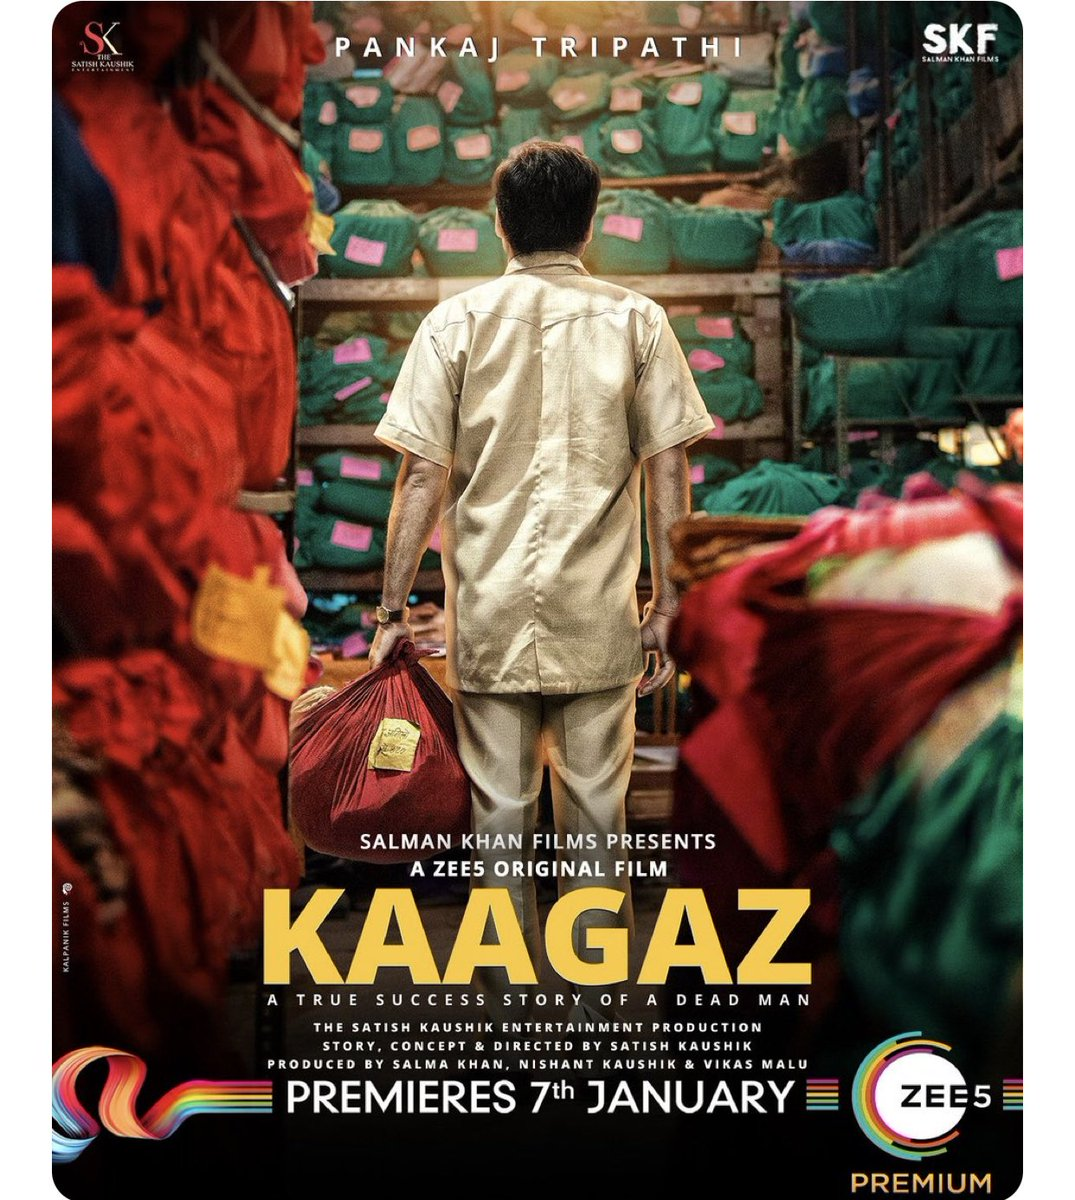 Kaagaz pe Lal Bihari Mritak ki kahaani hai badi atyachari. A true story, #Kaagaz premieres 7th Jan2021. In select theatres, in UP #ProofHainKya @SKFilmsOfficial @satishkaushik2 @ZEE5Premium @TripathiiPankaj @Gajjarmonal  @TheAmarUpadhyay #mitavasisht  @Nishantkaushikk #vikasmalu